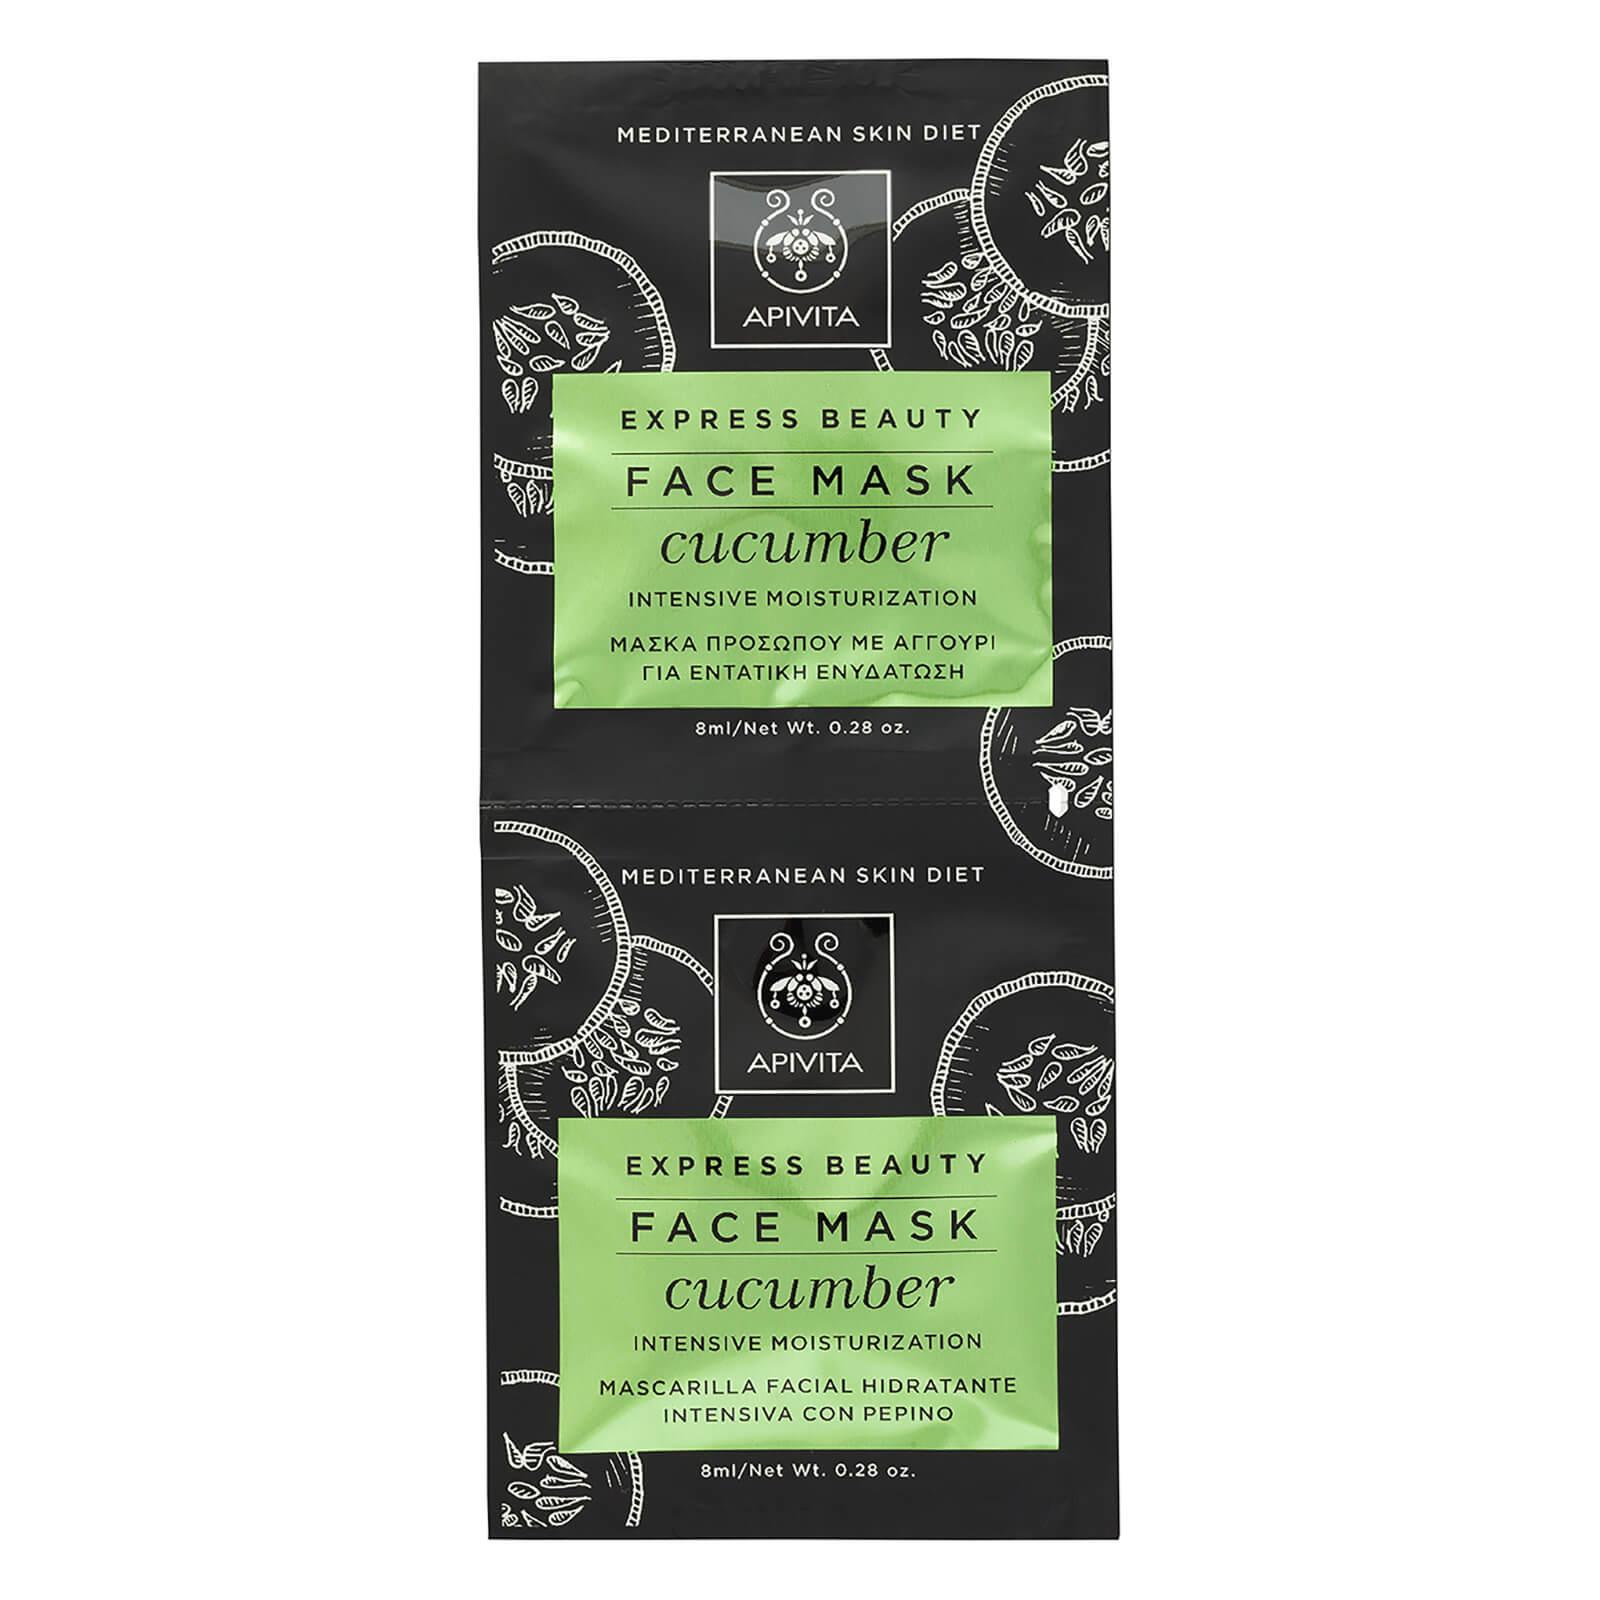 APIVITA Express Intense Moisturizing Face Mask - Cucumber 2x8ml